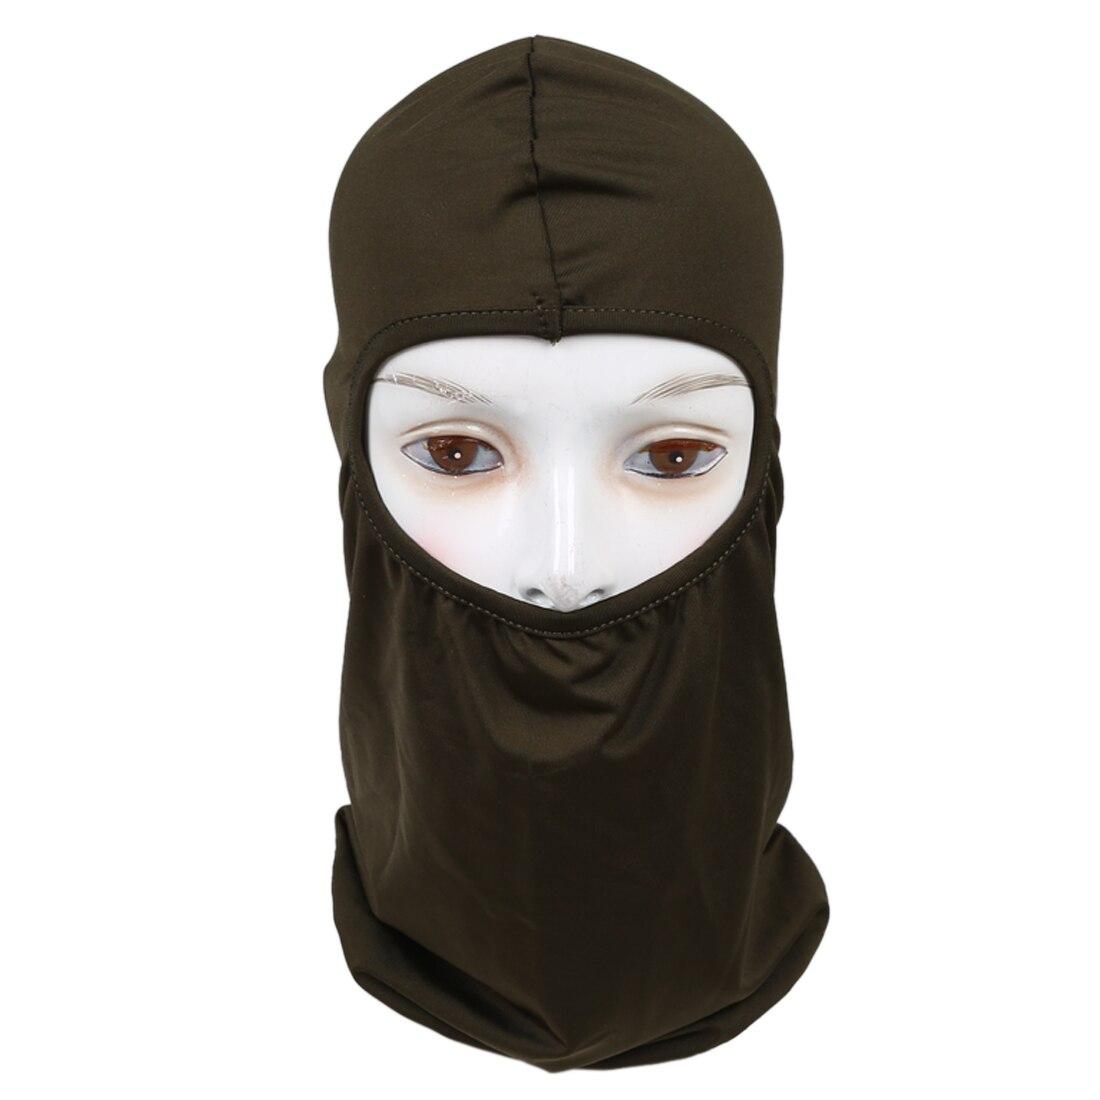 Ultra Thin Ski Bike Bicycle Face Mask Sports Football Helmet Army Green